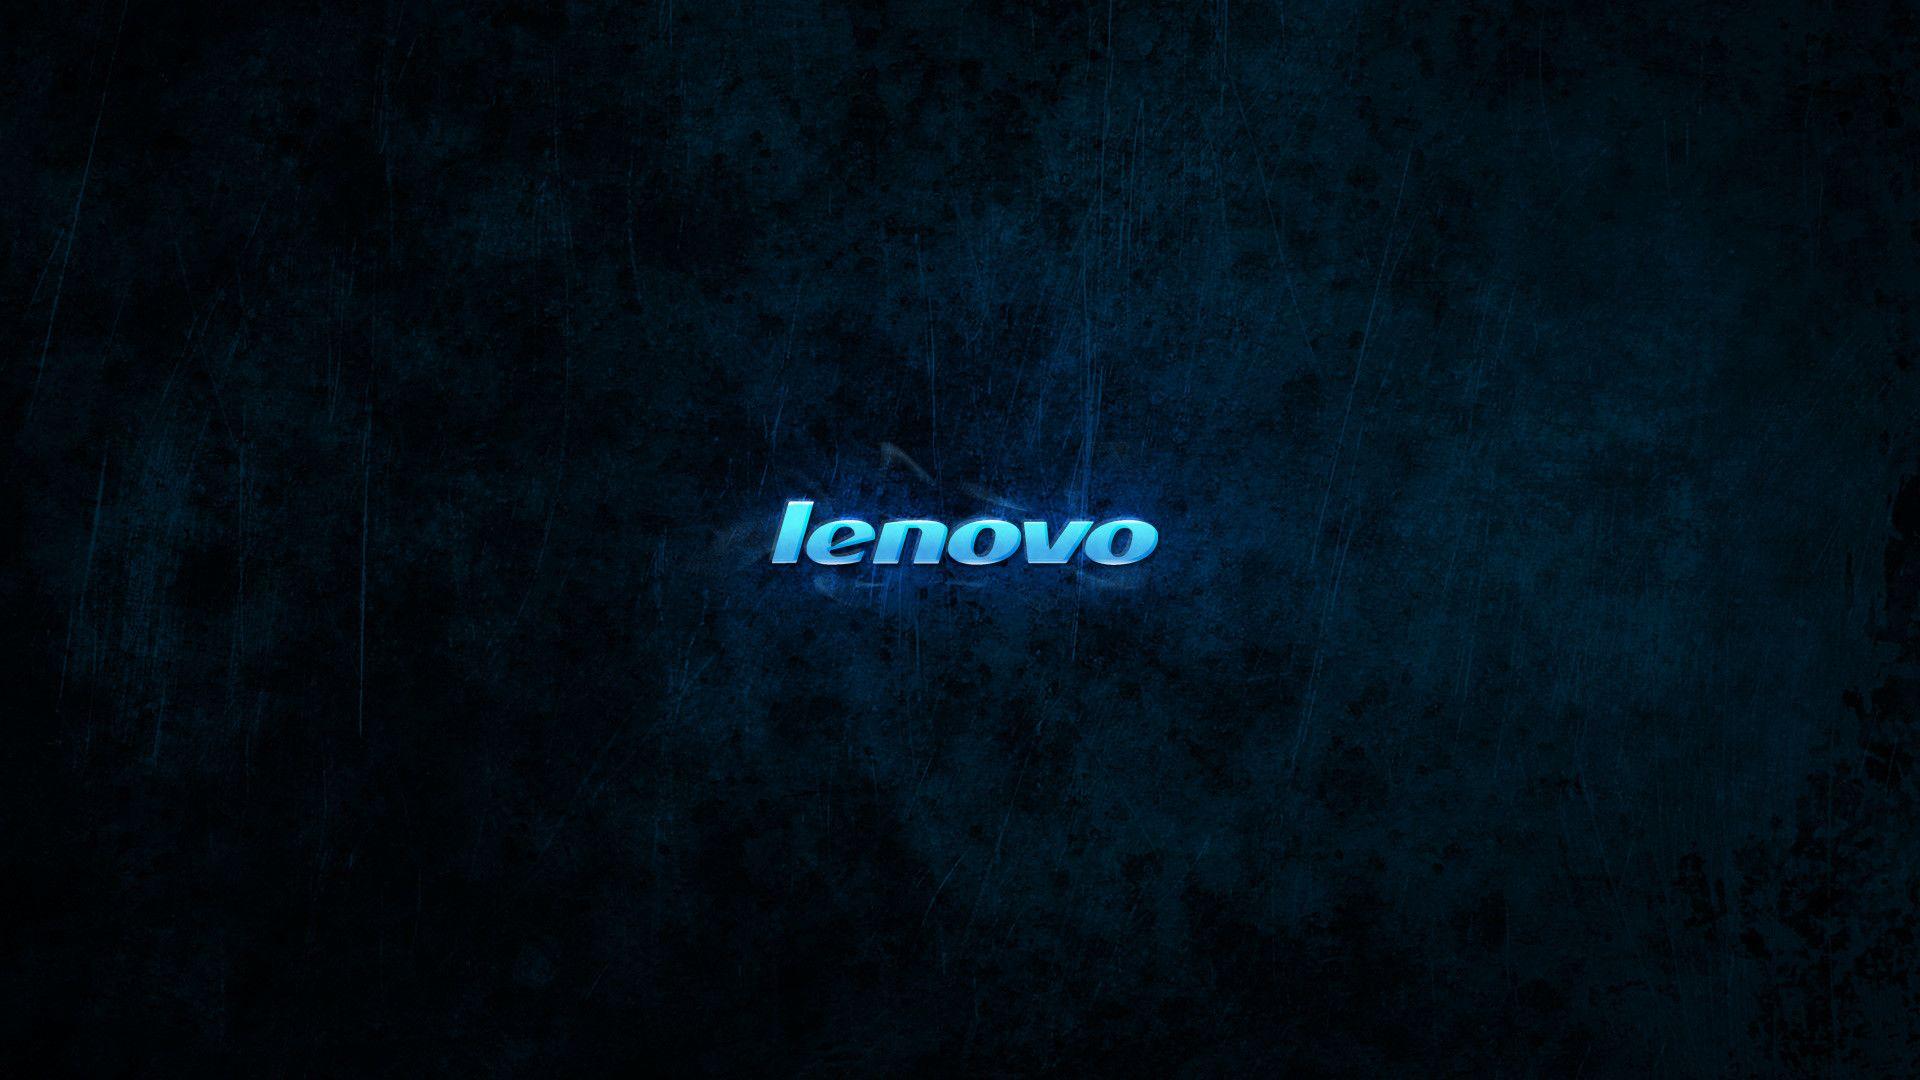 Lenovo 4K Wallpapers   Top Lenovo 4K Backgrounds 1920x1080